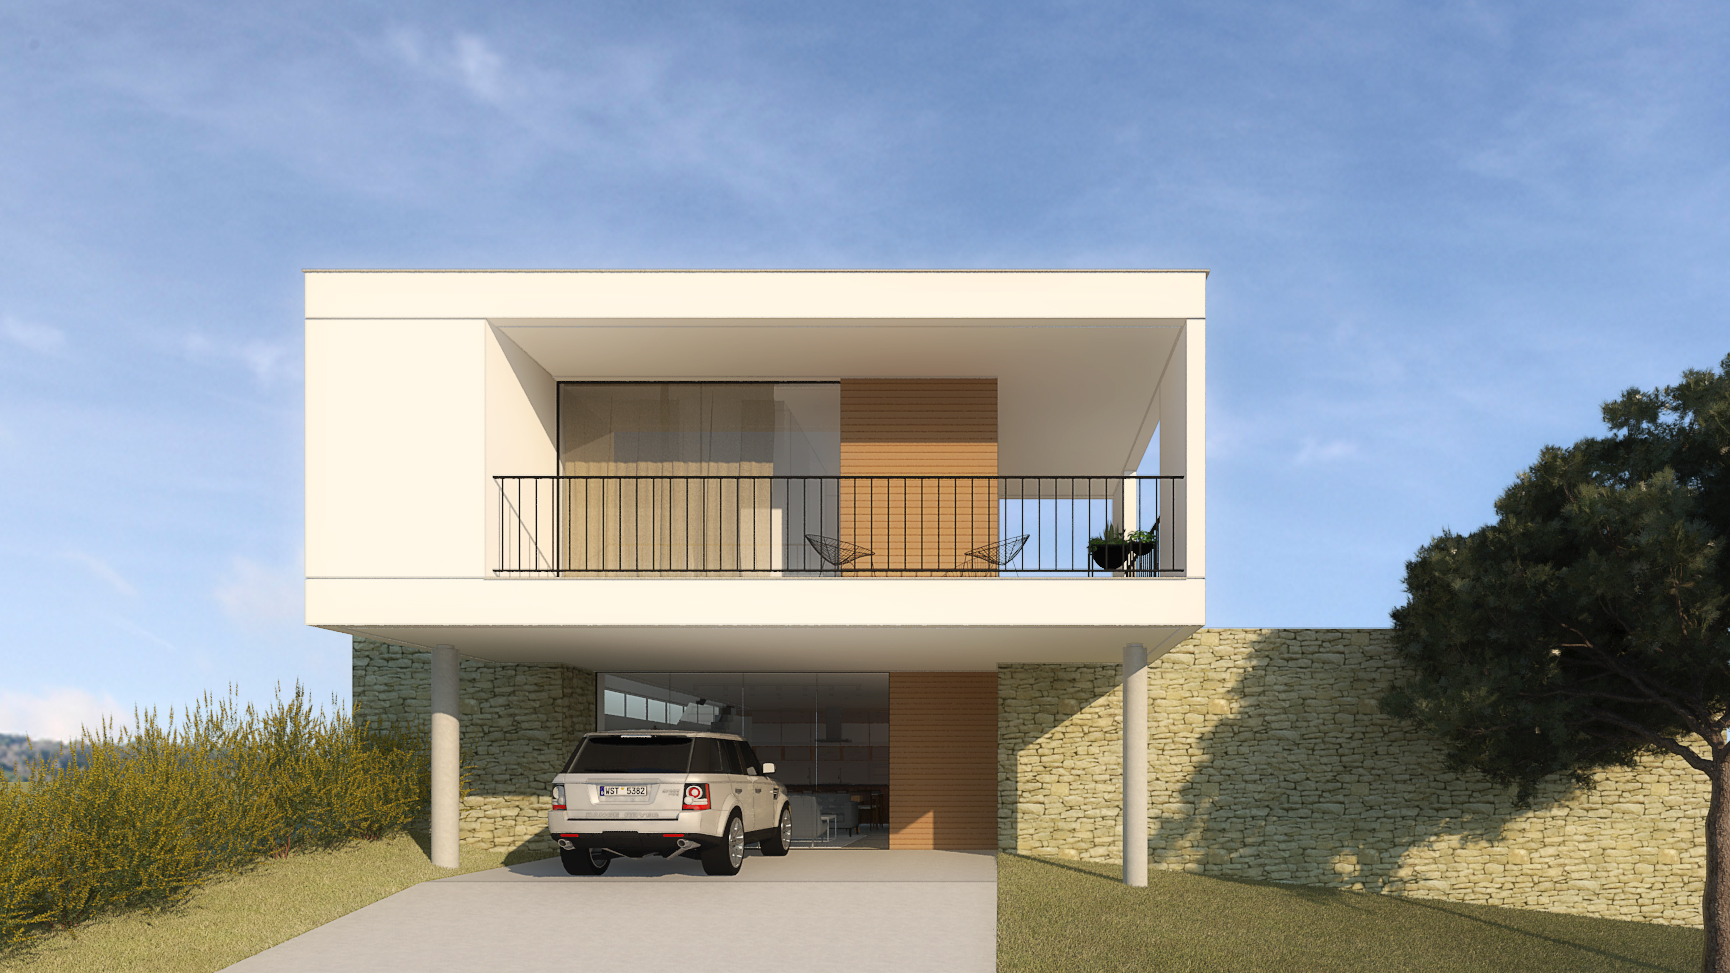 residencia-dm-daniel-carvalho-arquiteto-brumadinho-casa-branca-1.jpg